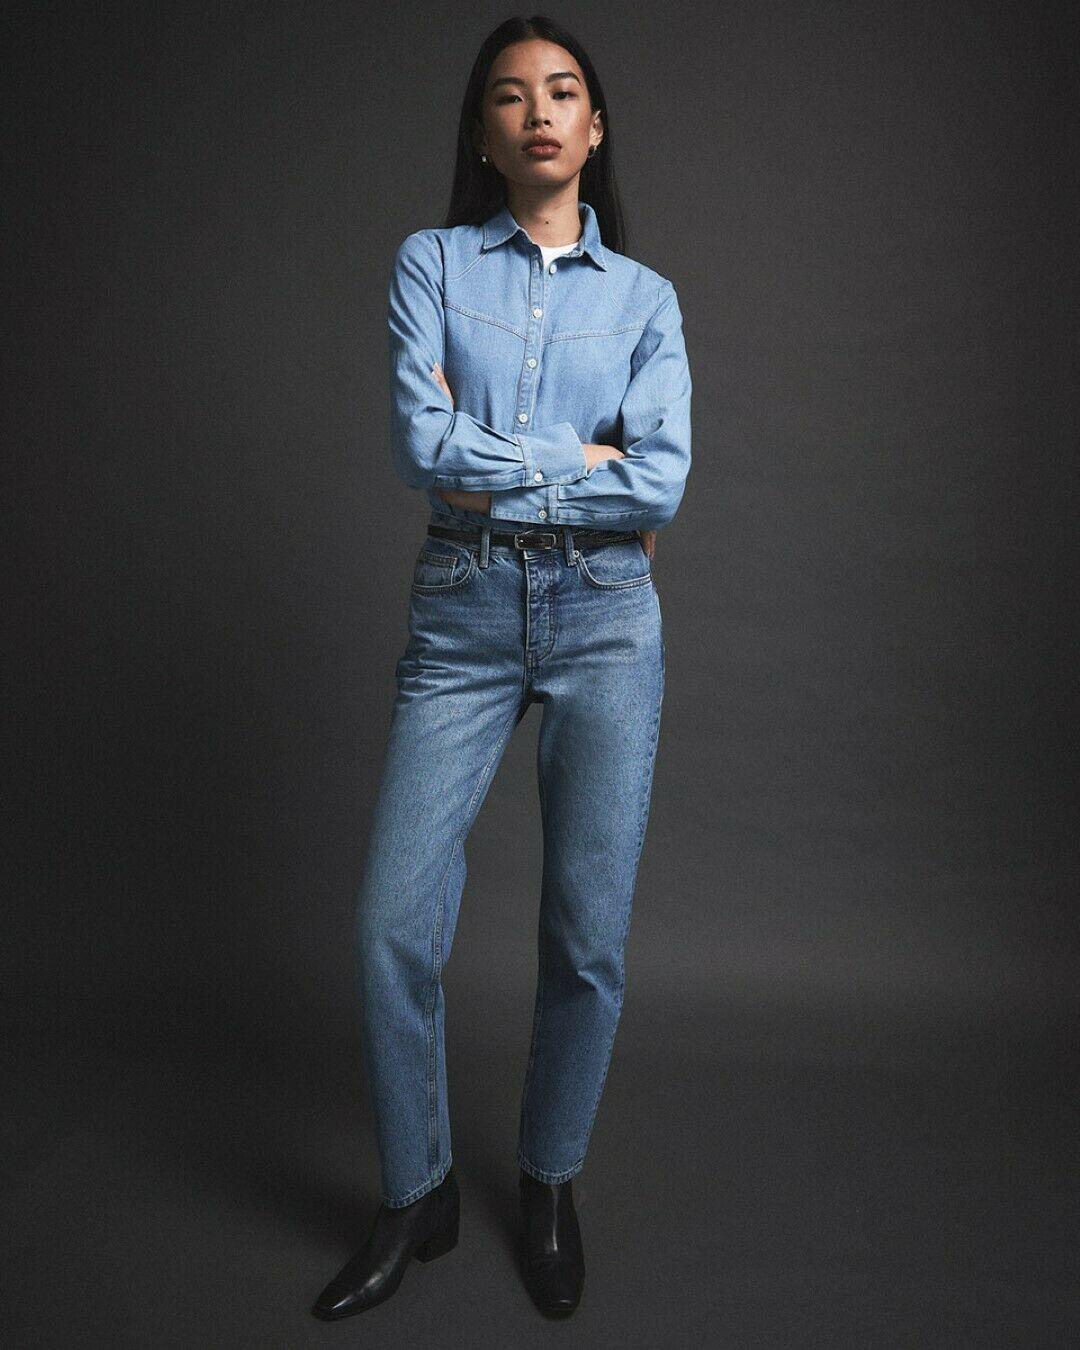 Jigsaw Blenheim Classic Straight Jeans Blue  Current 2020 Range RRP £85